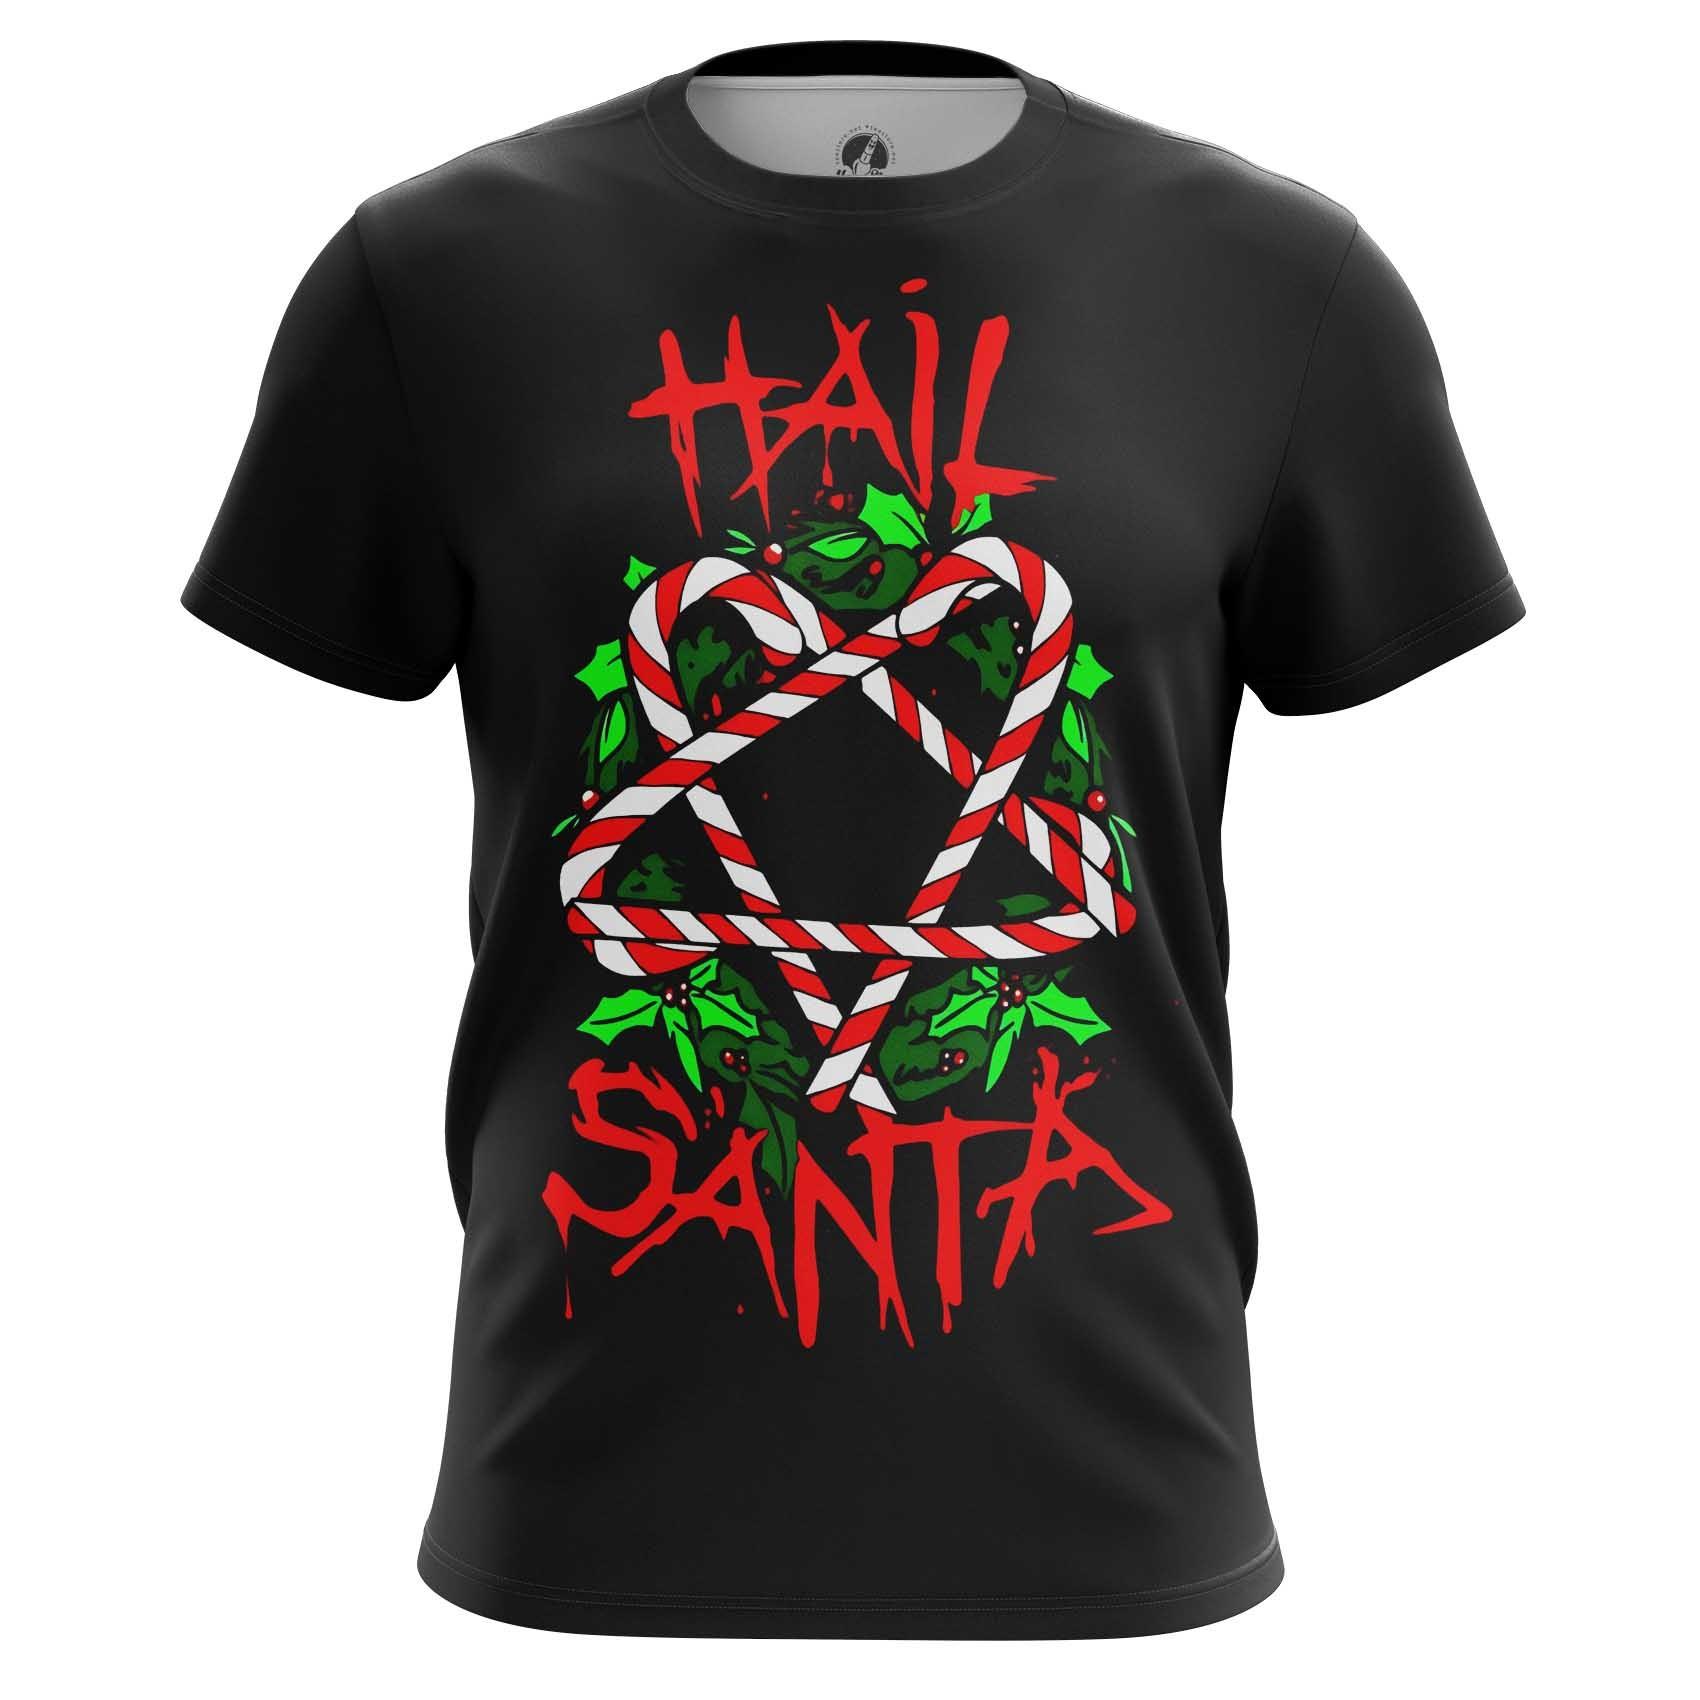 Merchandise T-Shirt Hail Santa Claus Christmas Worship